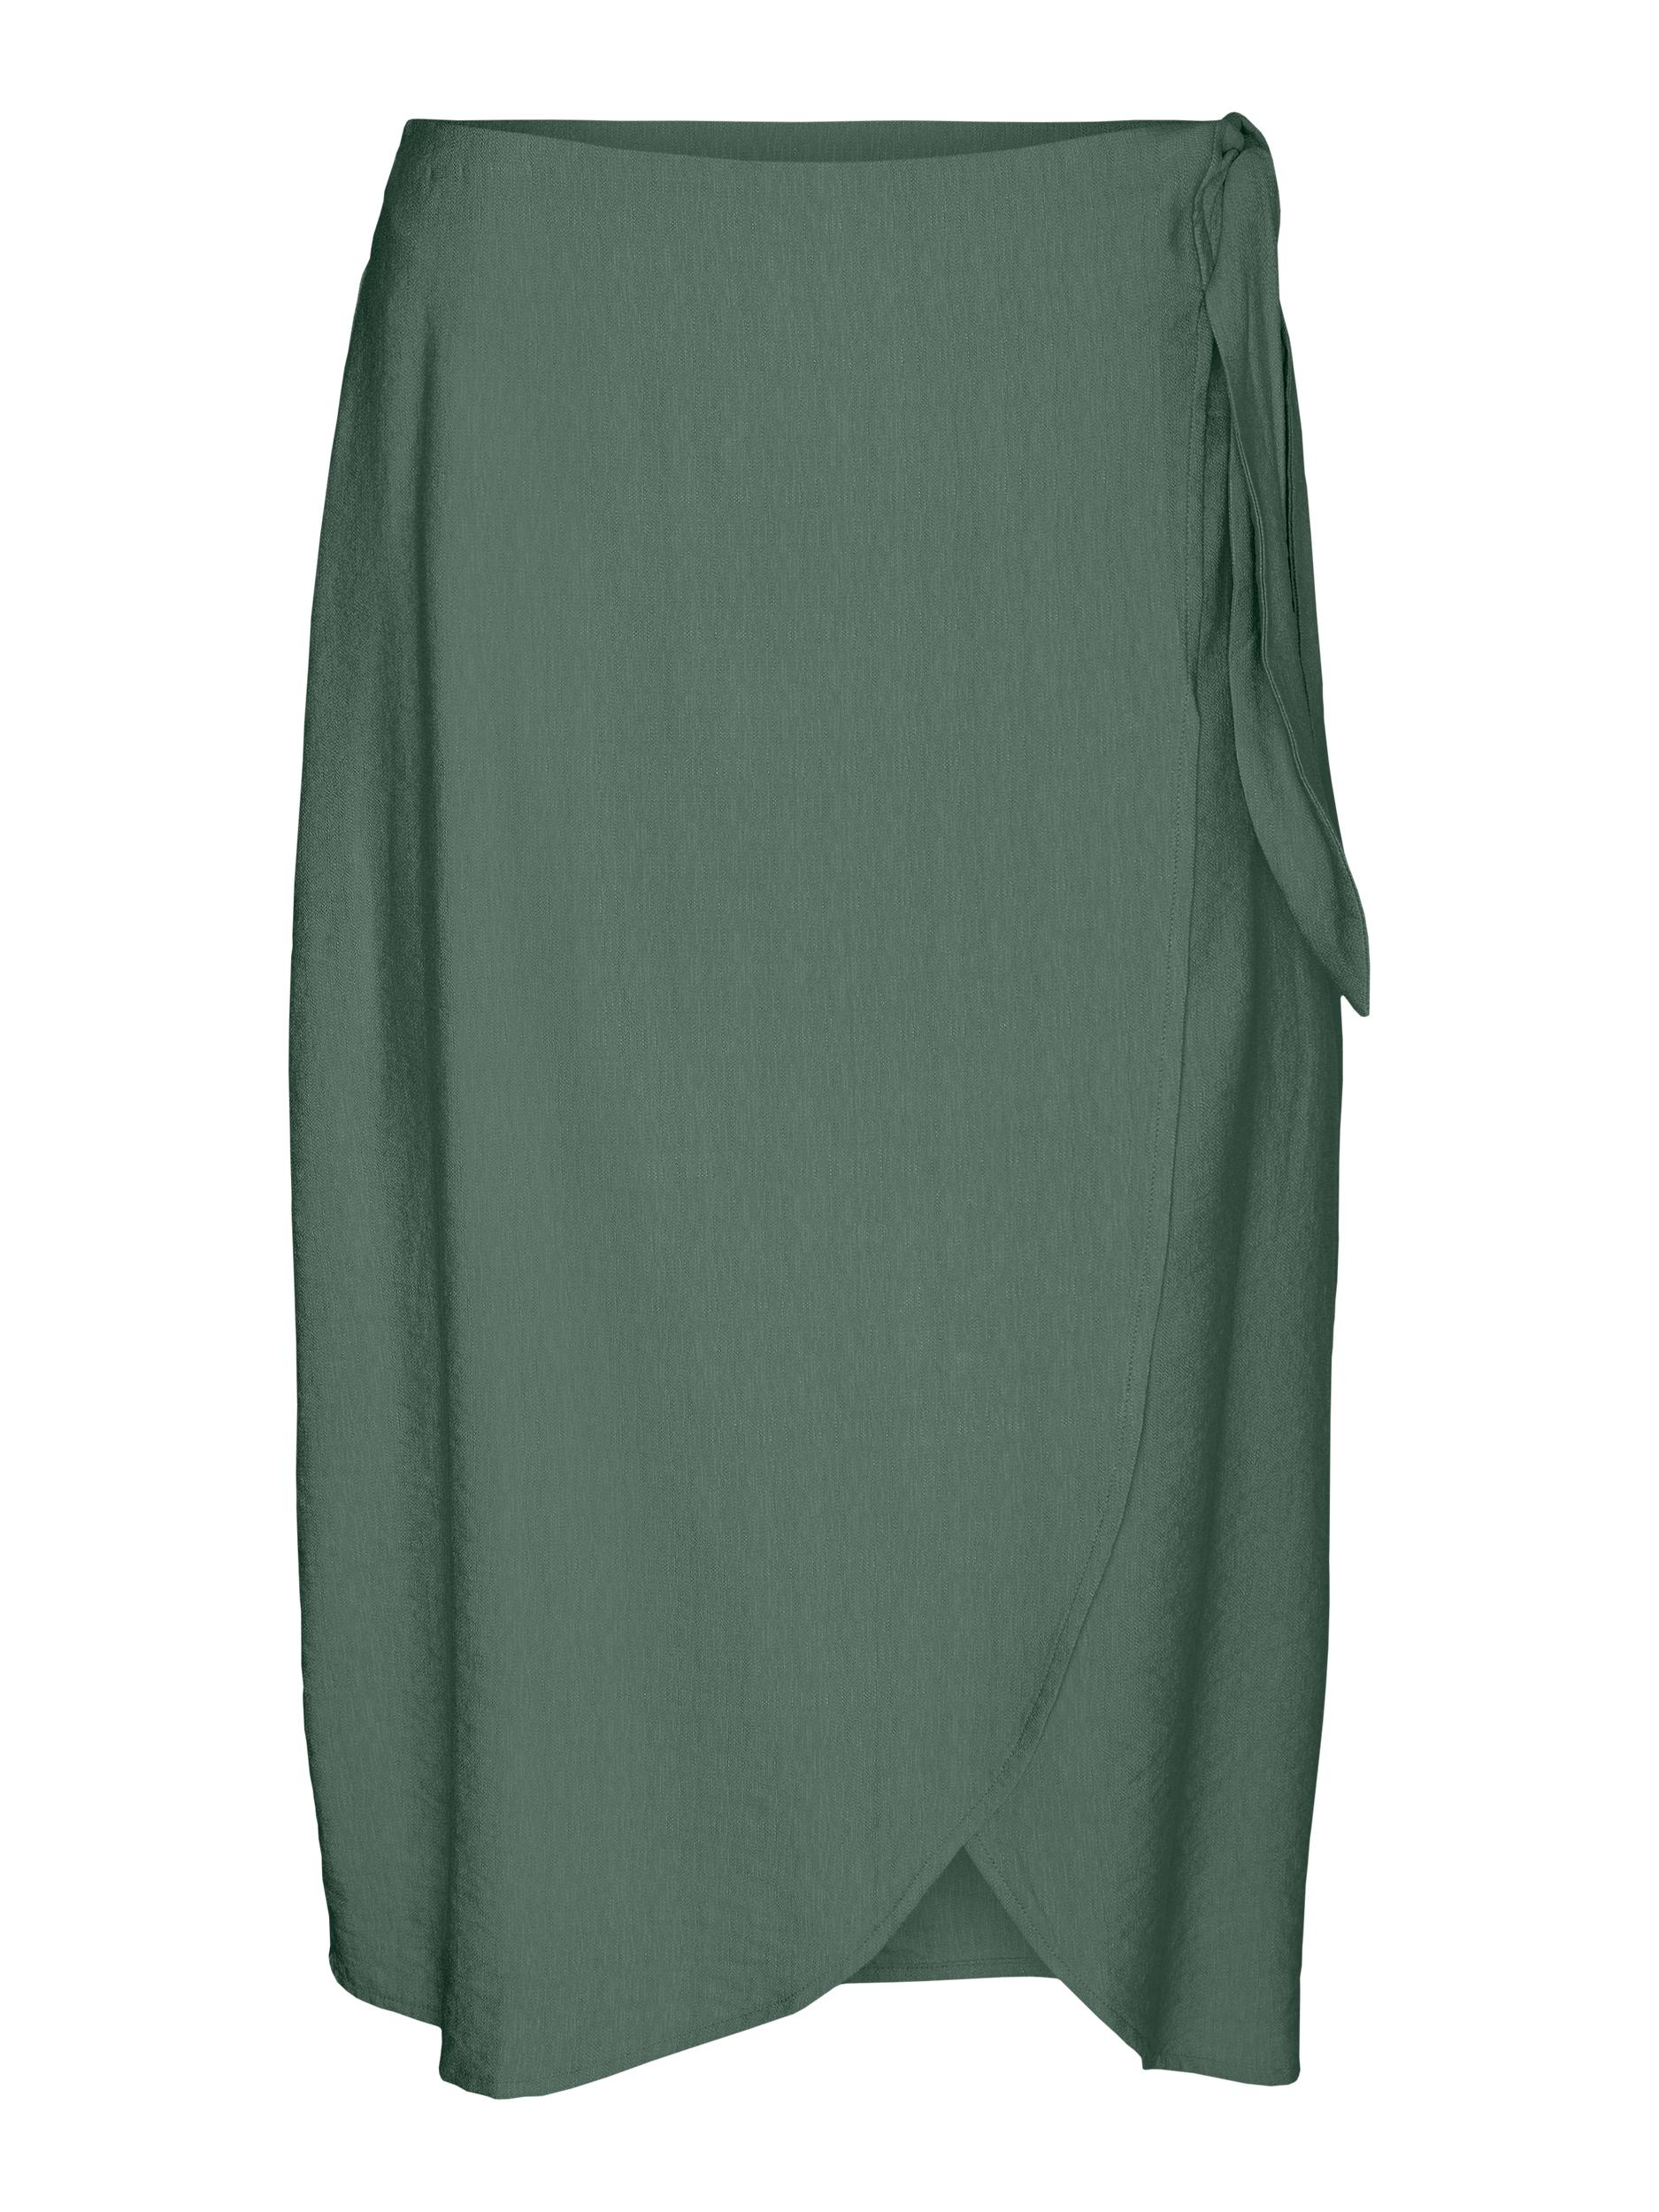 Vero Moda Megna nederdel, laurel wreath, small